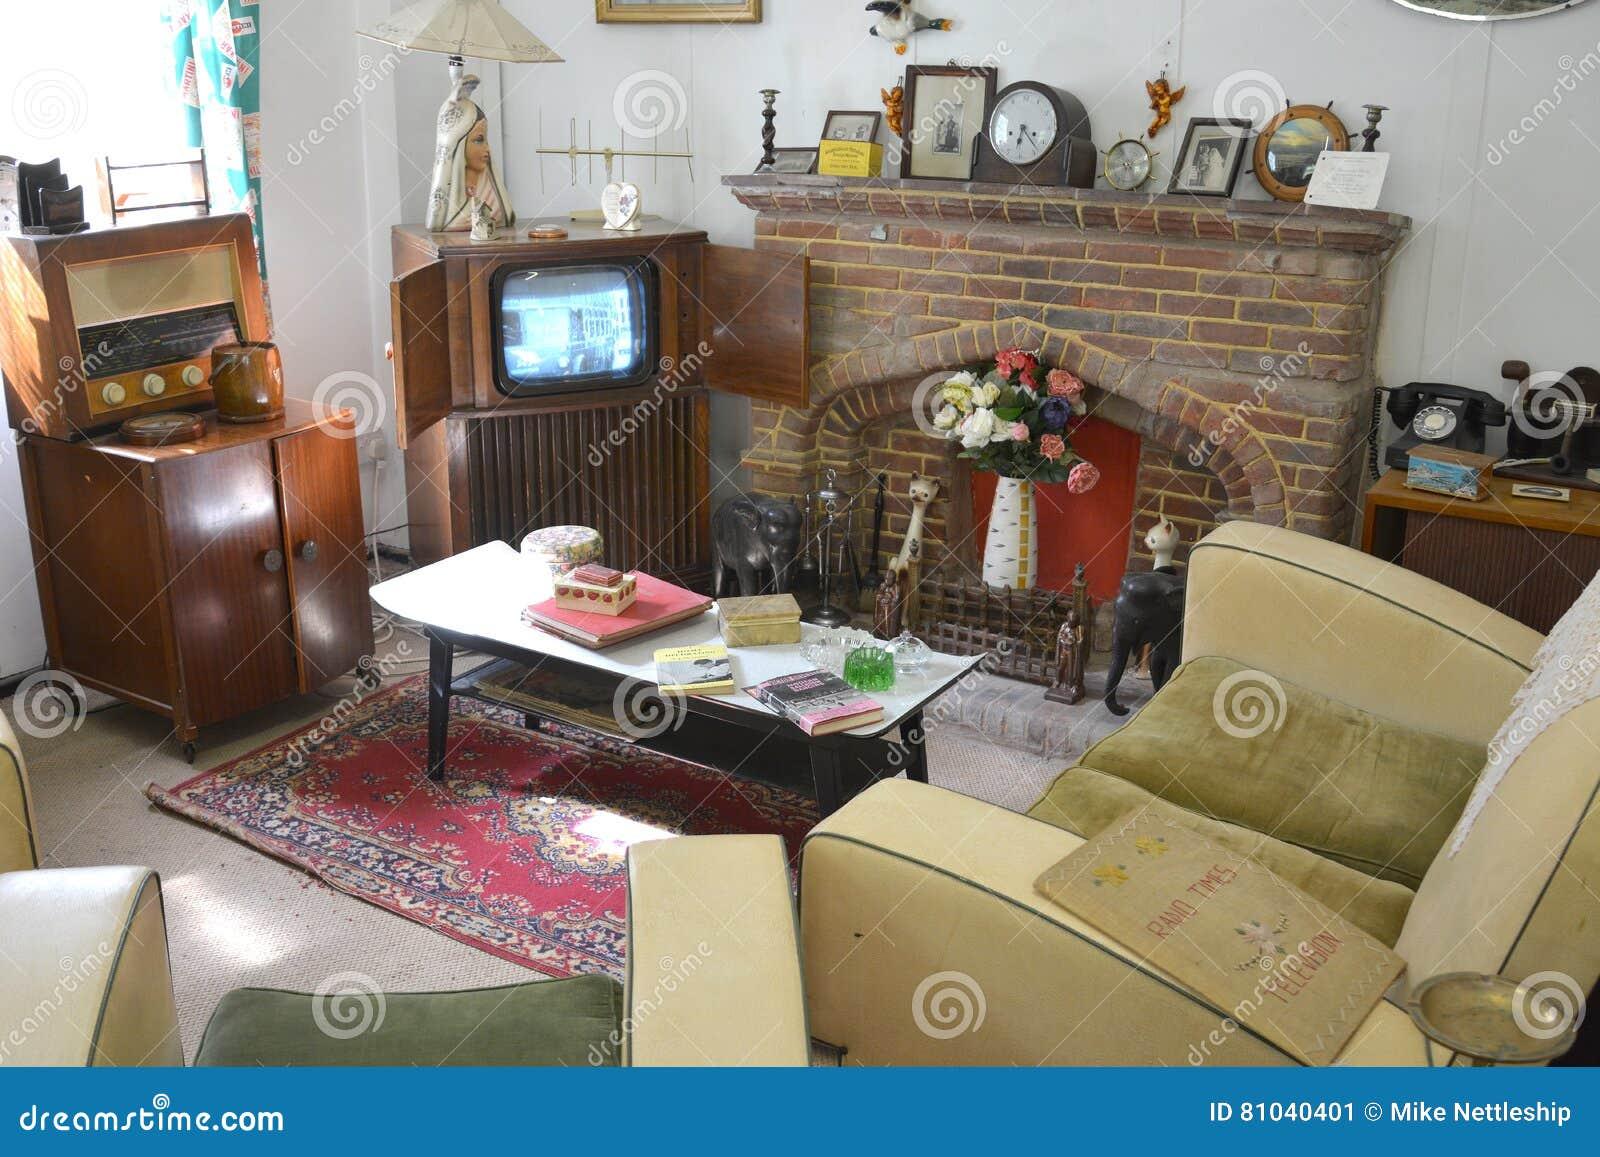 Una sala de estar de los a os 50 de los a os 40 con - Muebles anos 50 madrid ...